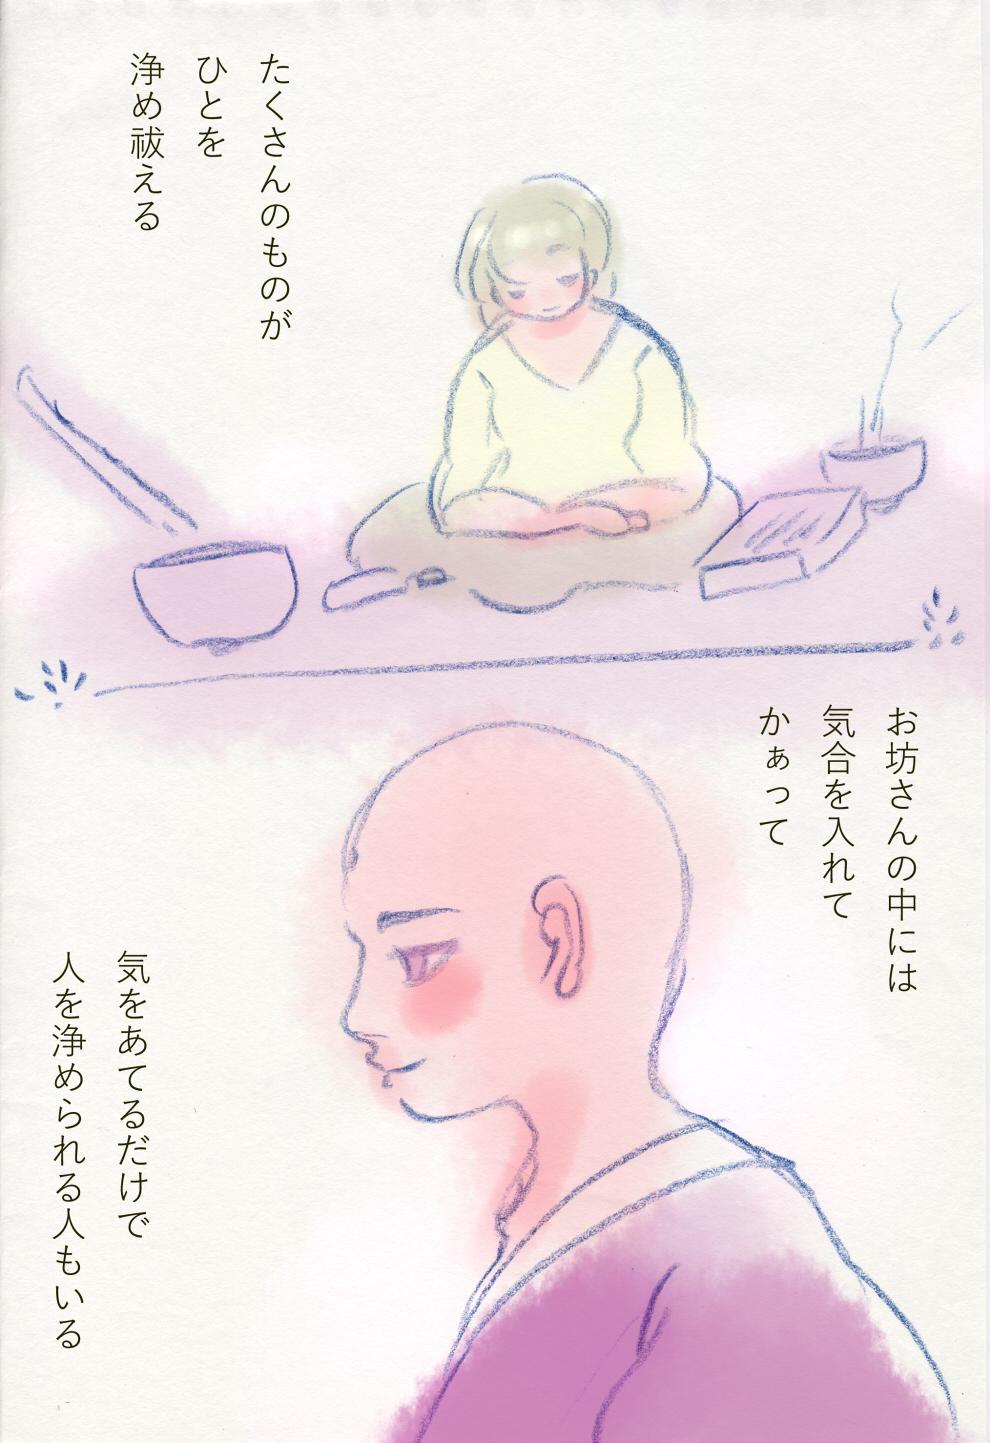 http://ahito.com/comic/ehon/kamiuta/img//20170810_14/01.jpg